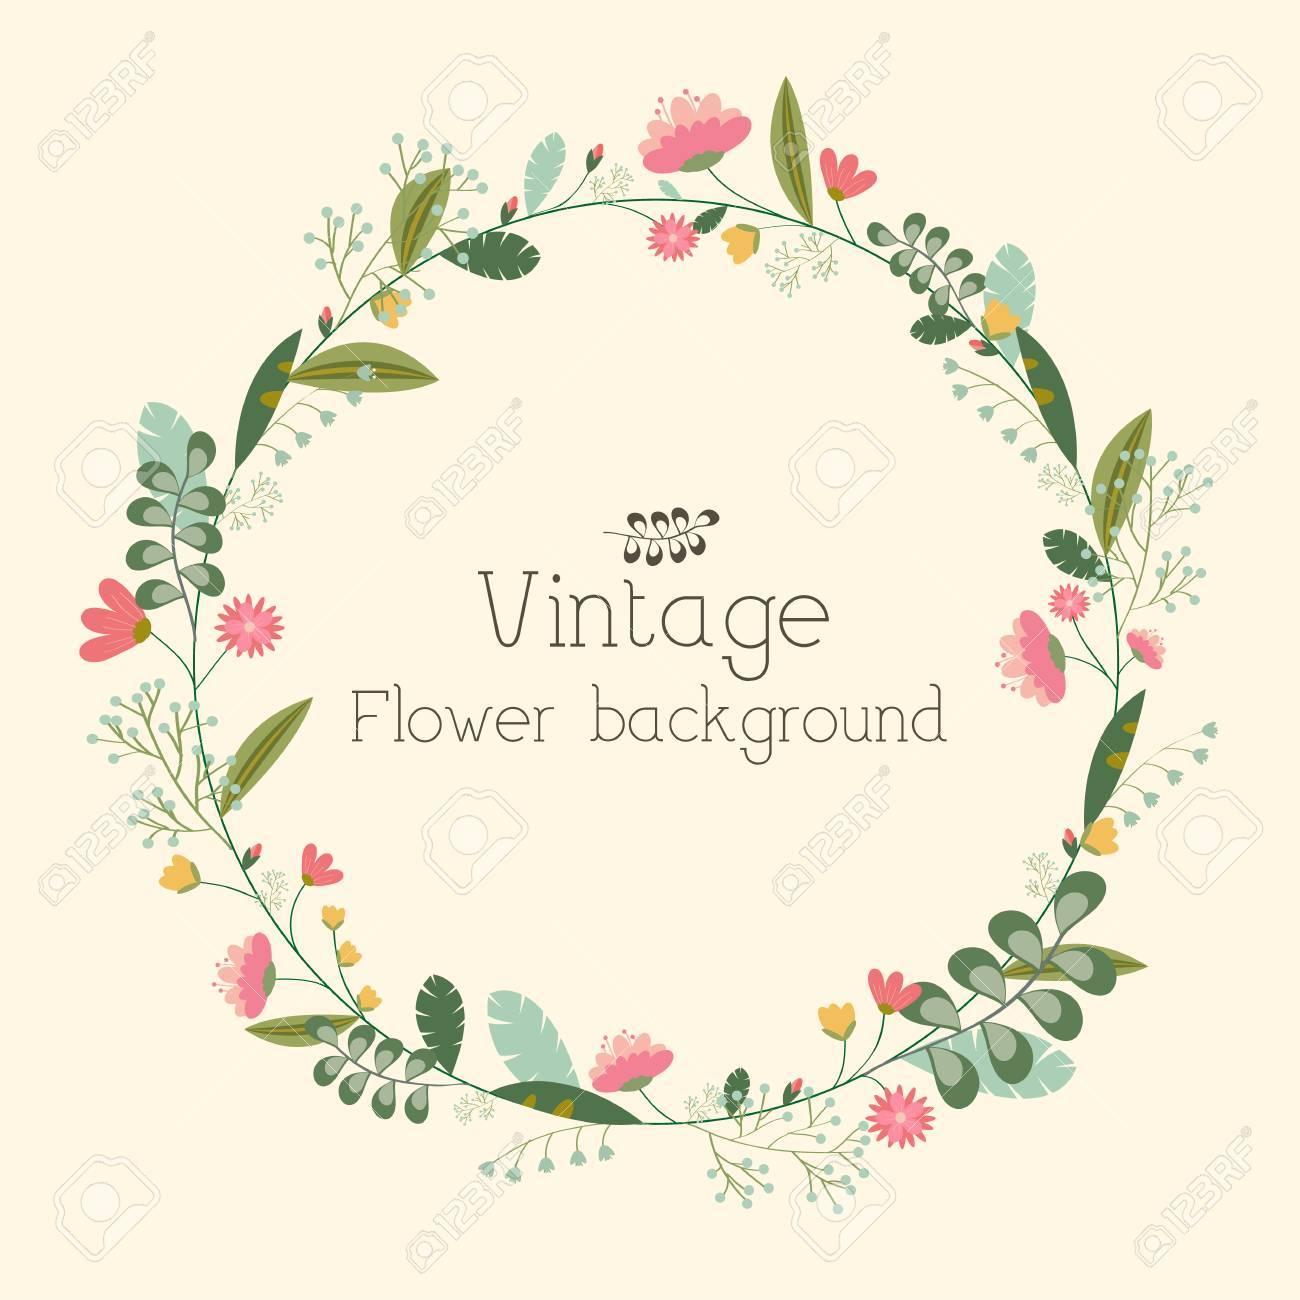 retro flower background concept. Vector illustration - 34300768